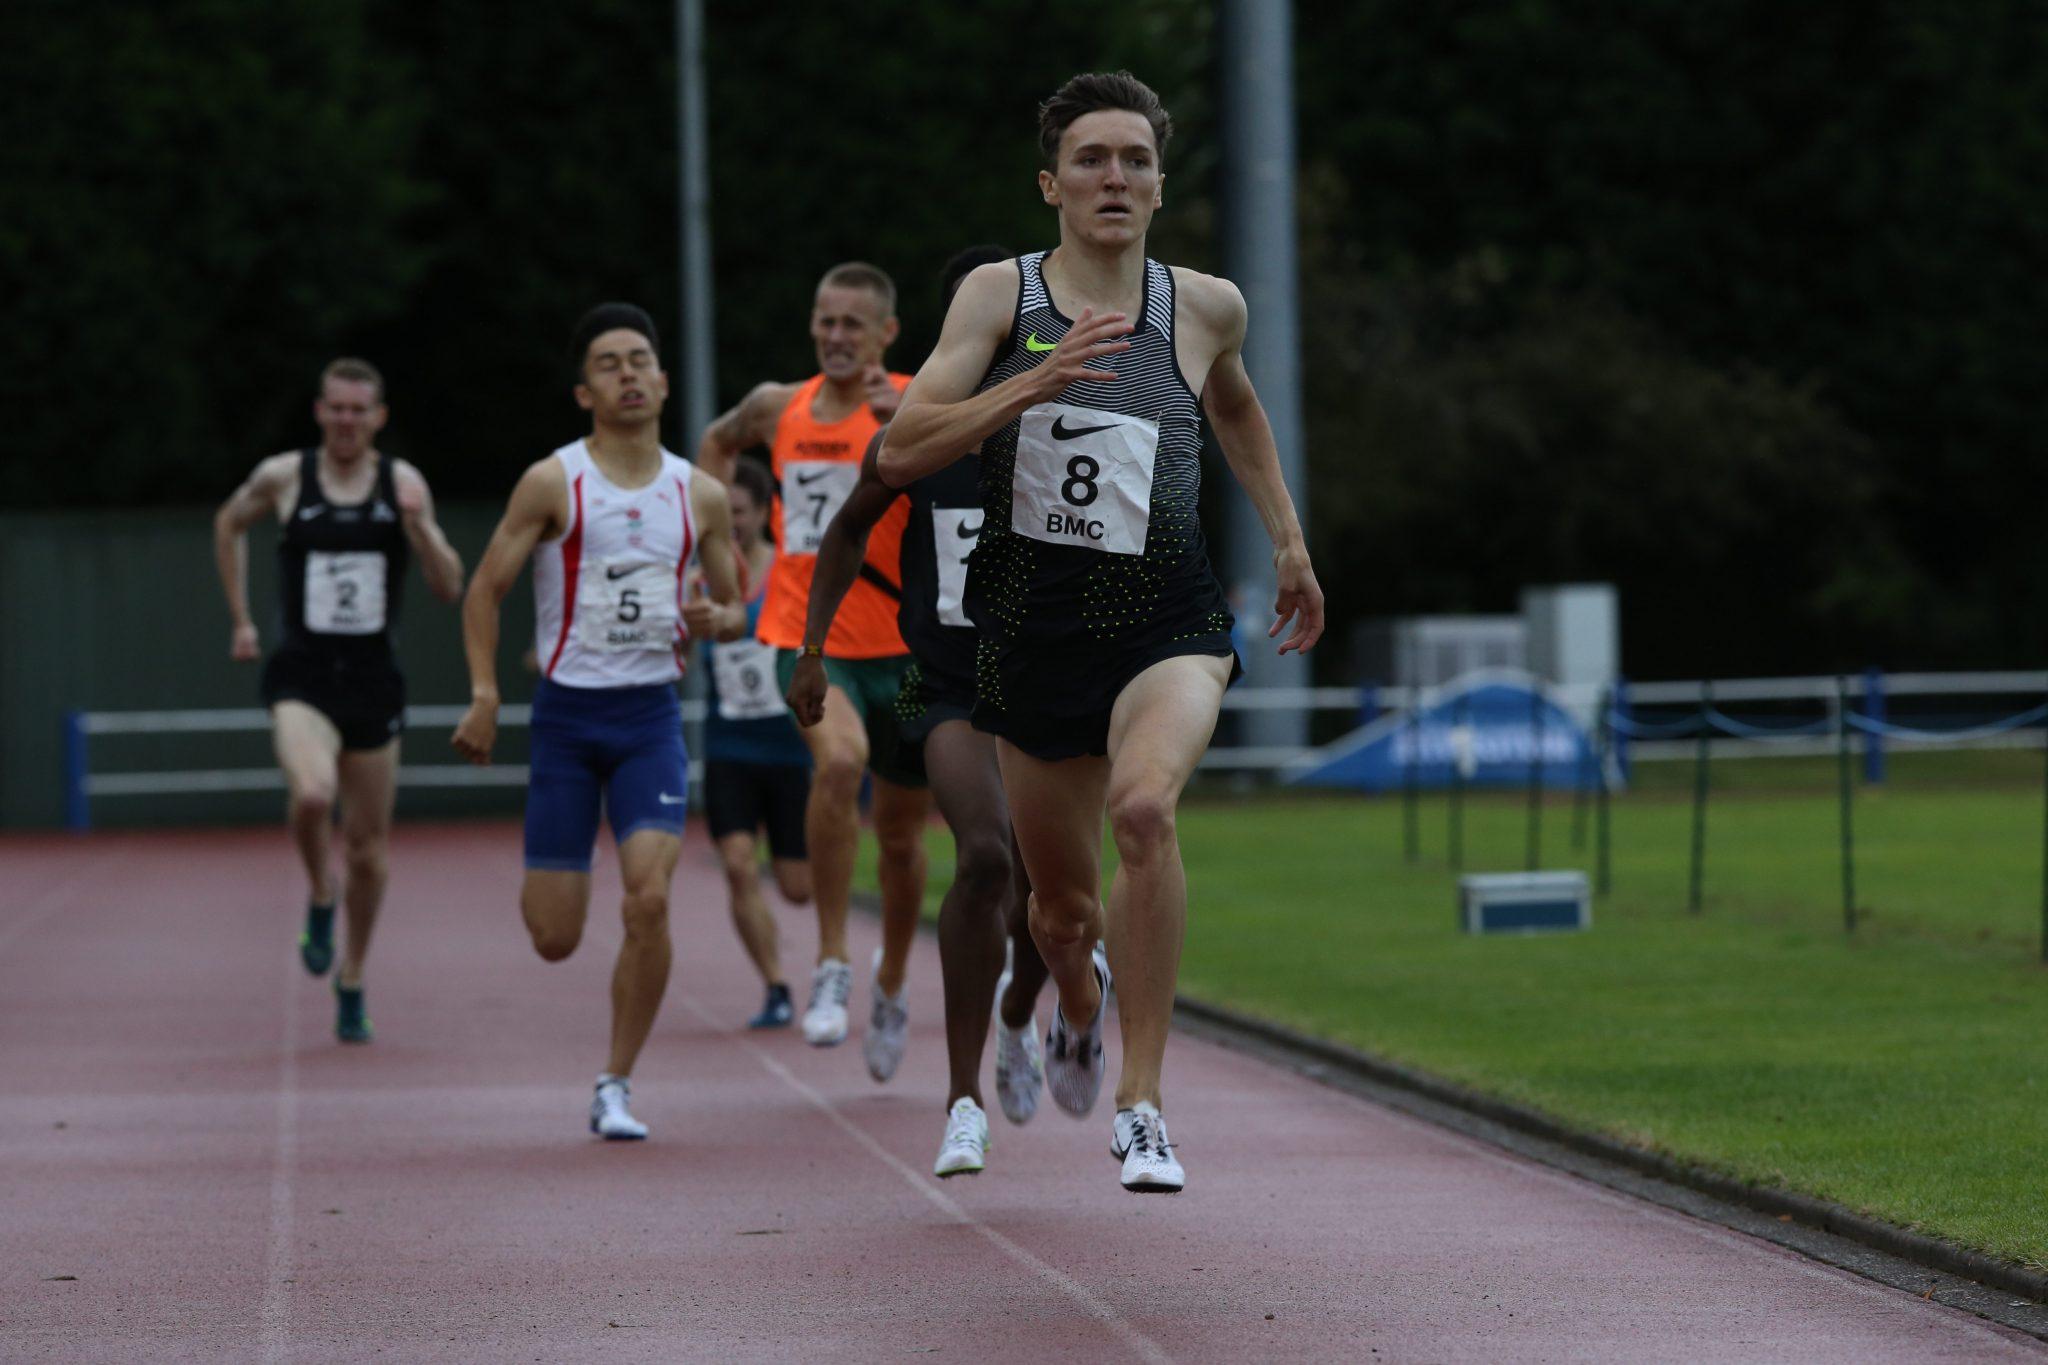 Jake Wightman stars at 100th British Milers' Club meeting – weekly round-up